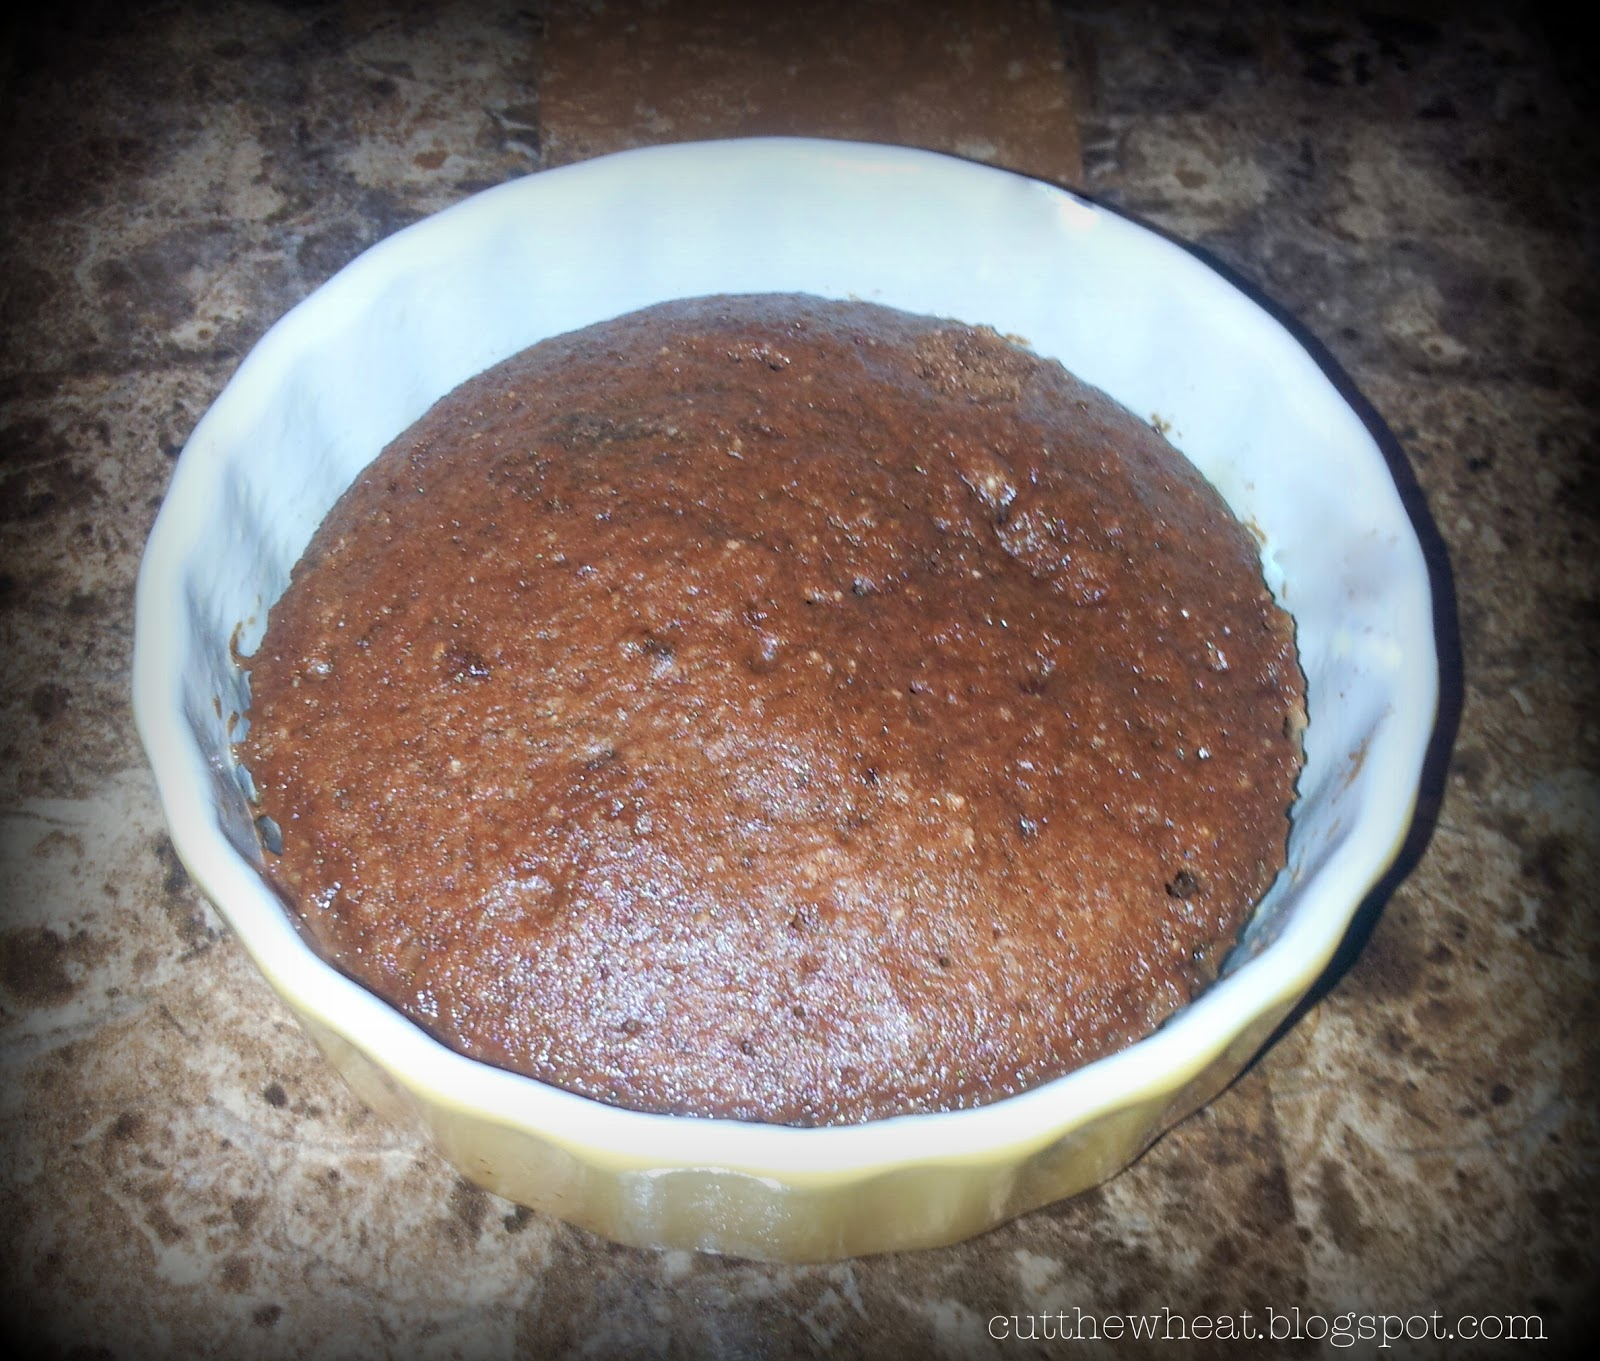 60 Second Paleo Chocolate Microwave Cake!